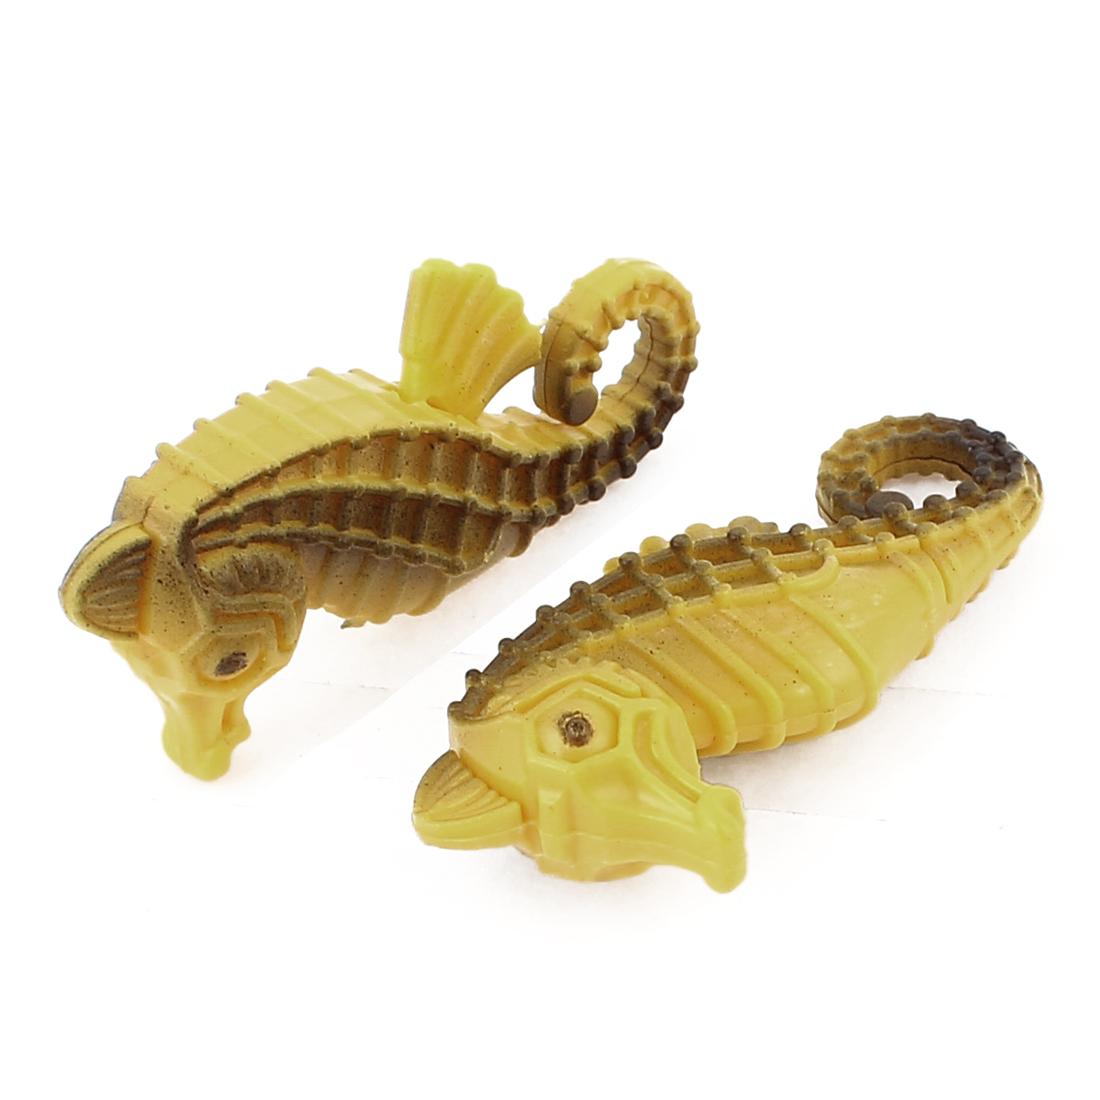 2 Pcs Artificial Plastic Floating Seahorse Ornament Yellow for Fish Tank Aquarium